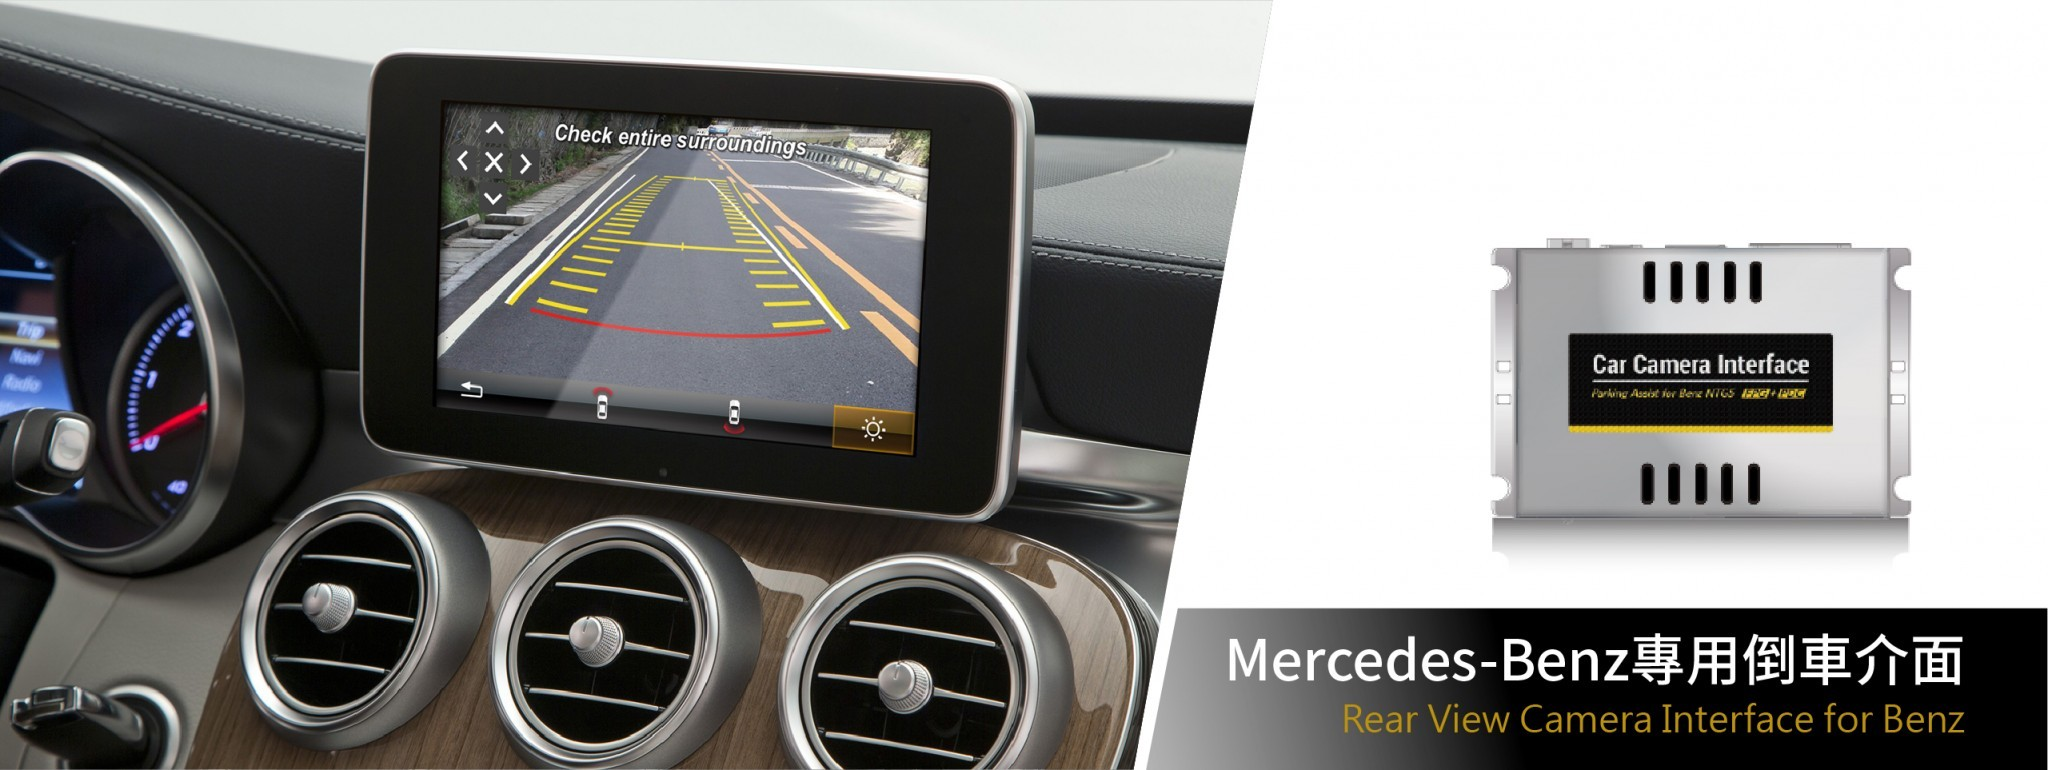 Mercedes-Benz專用倒車介面